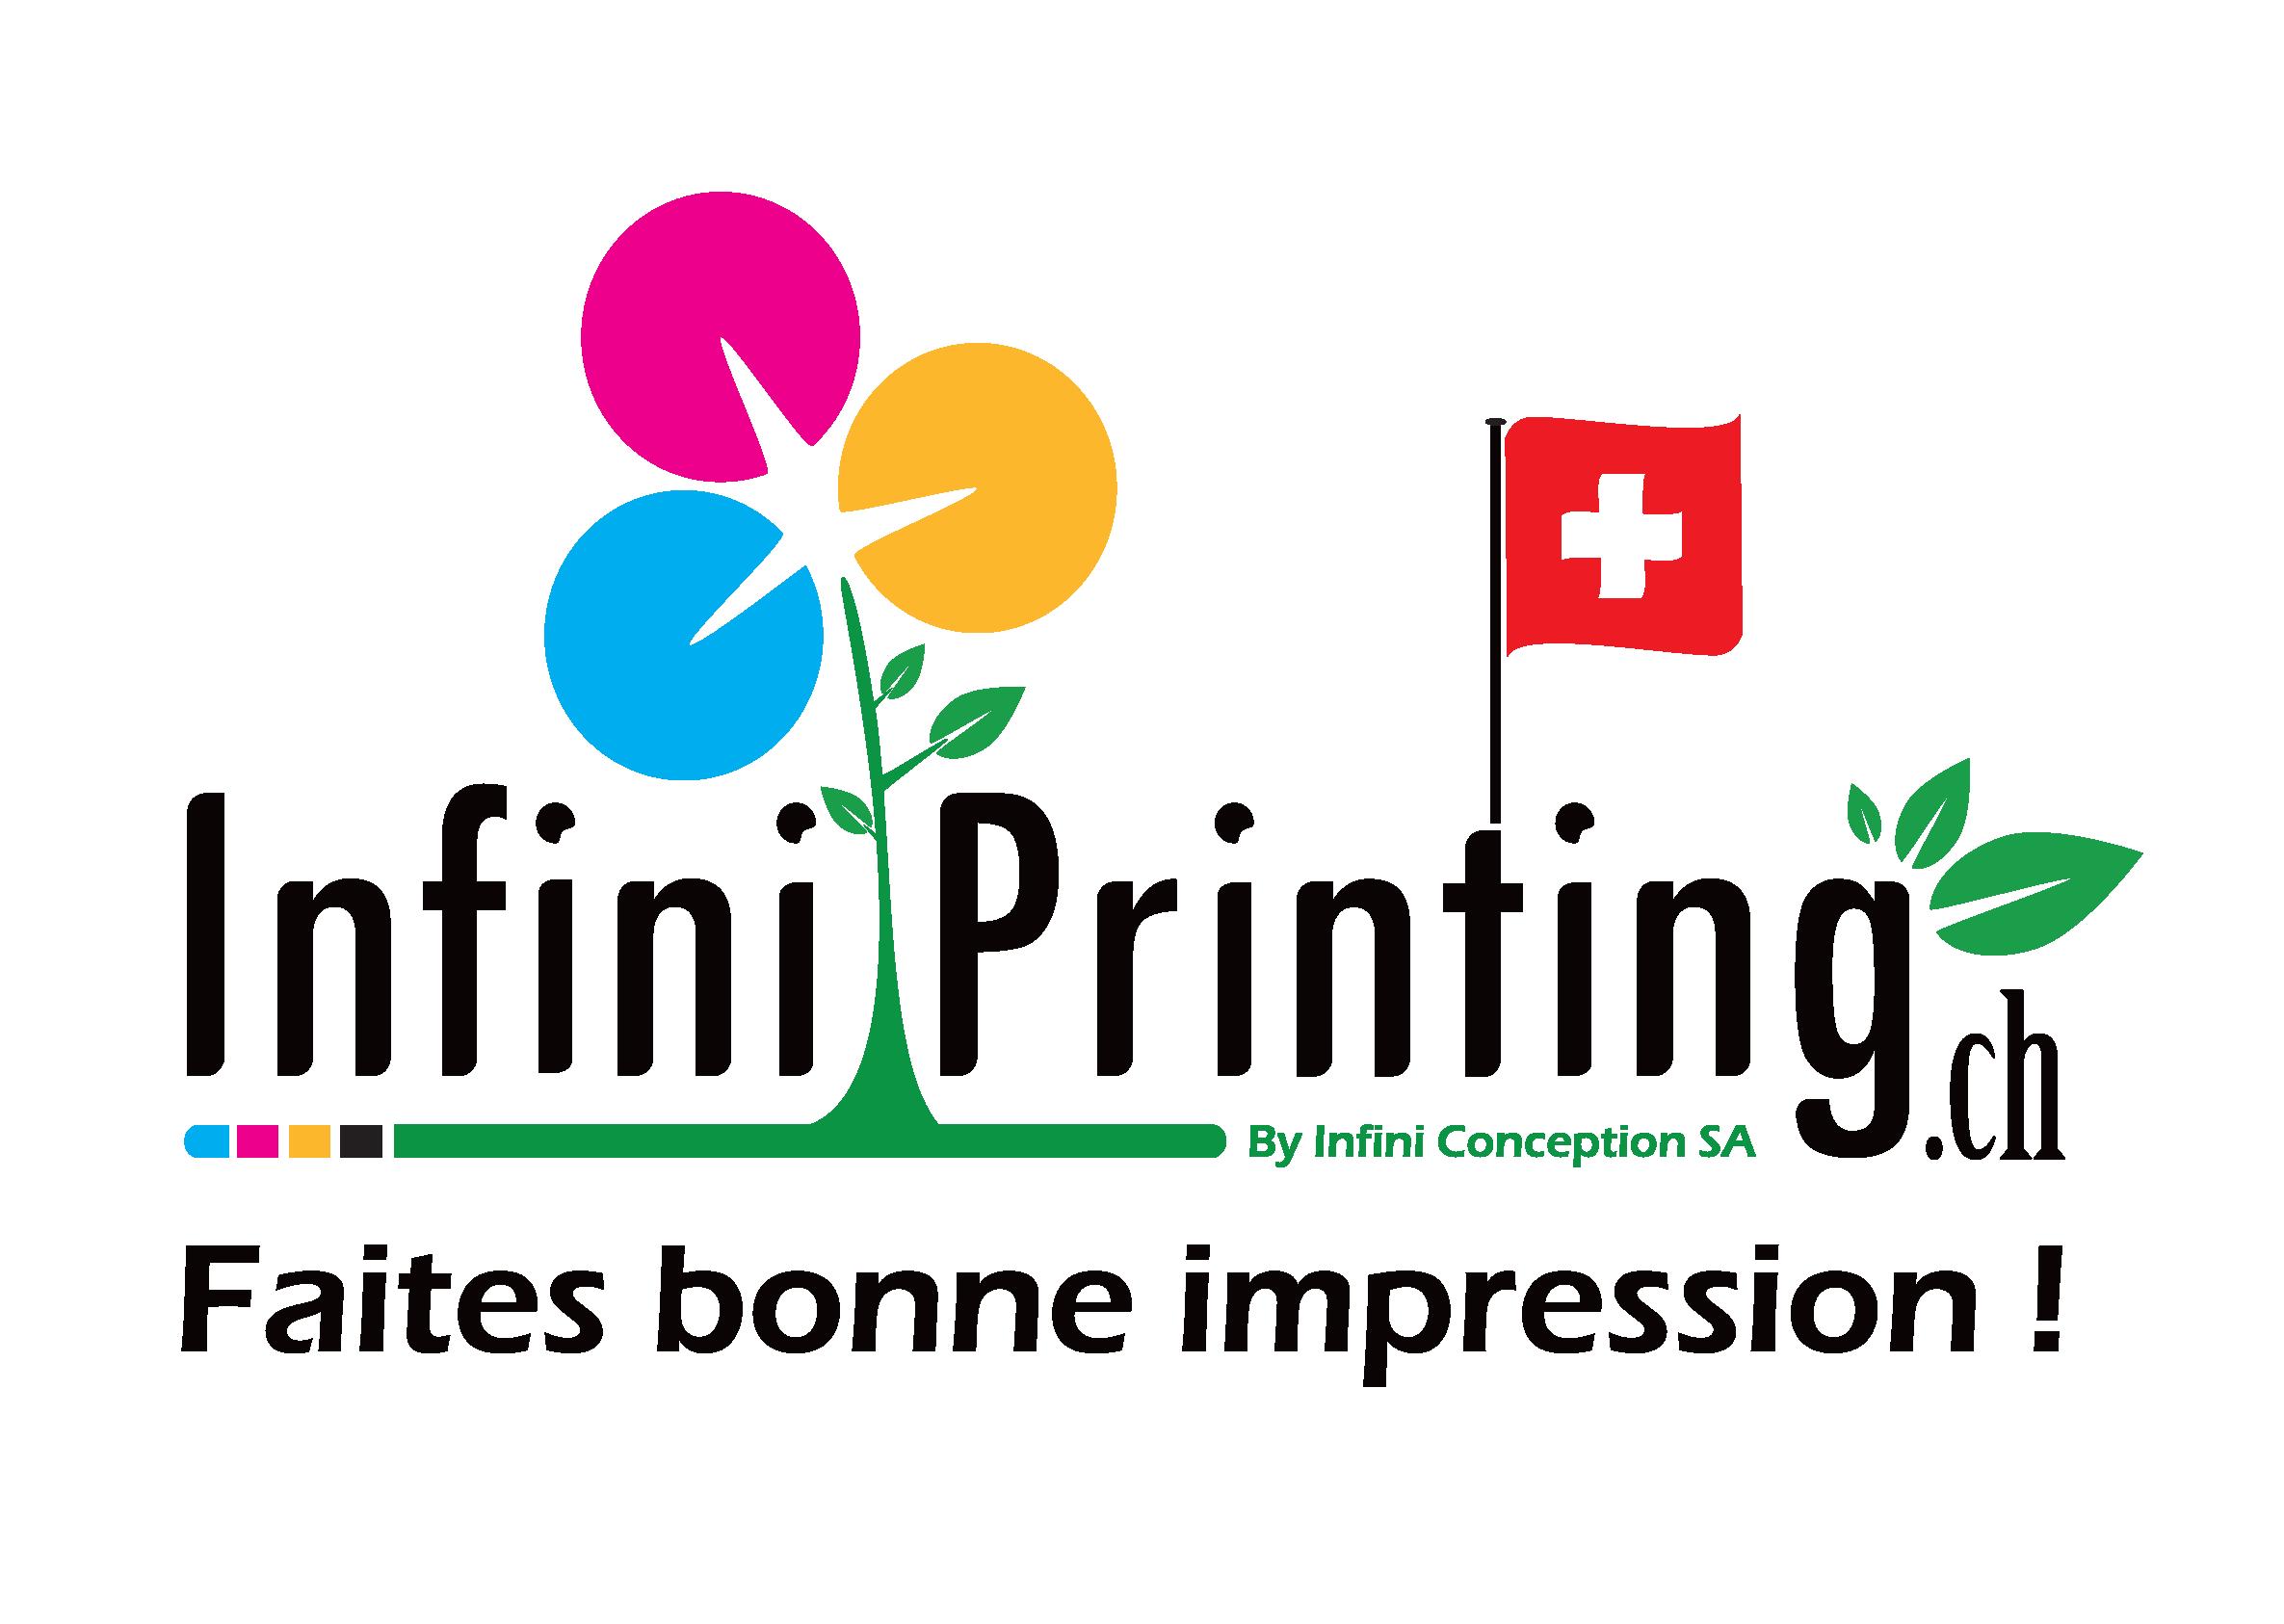 InfiniPrinting